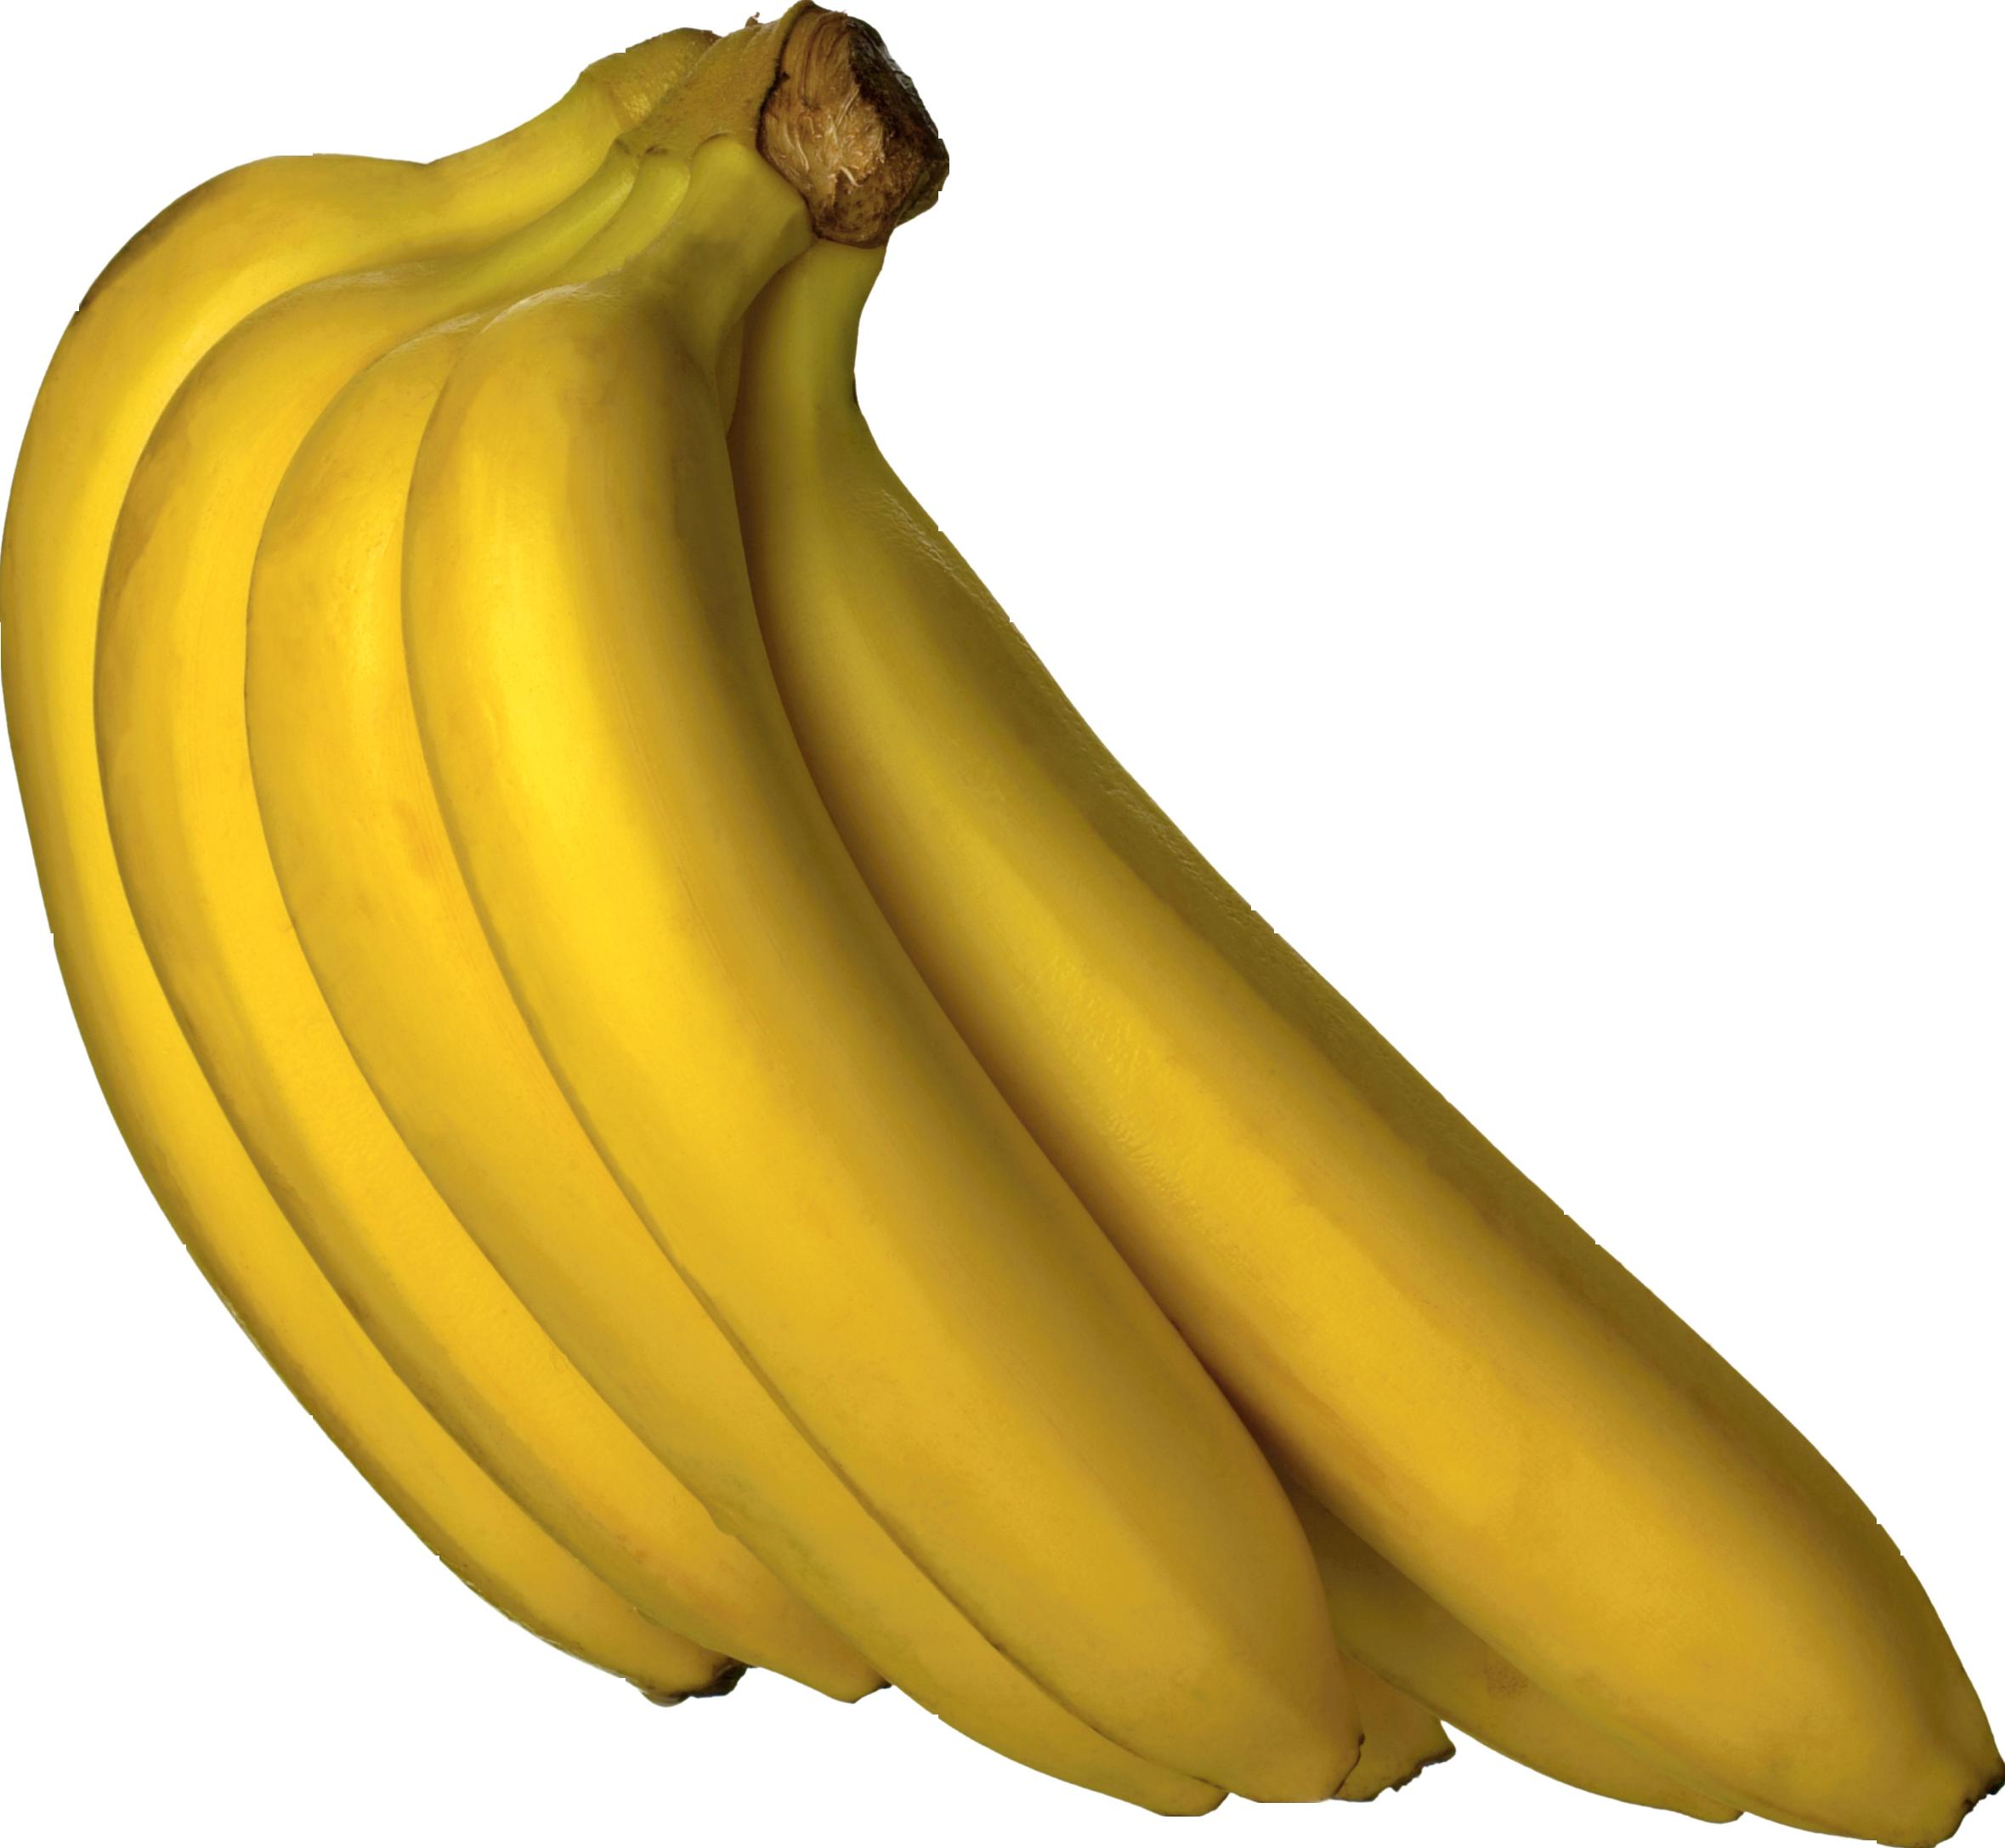 Banana S Banana Fruit Free Pictures